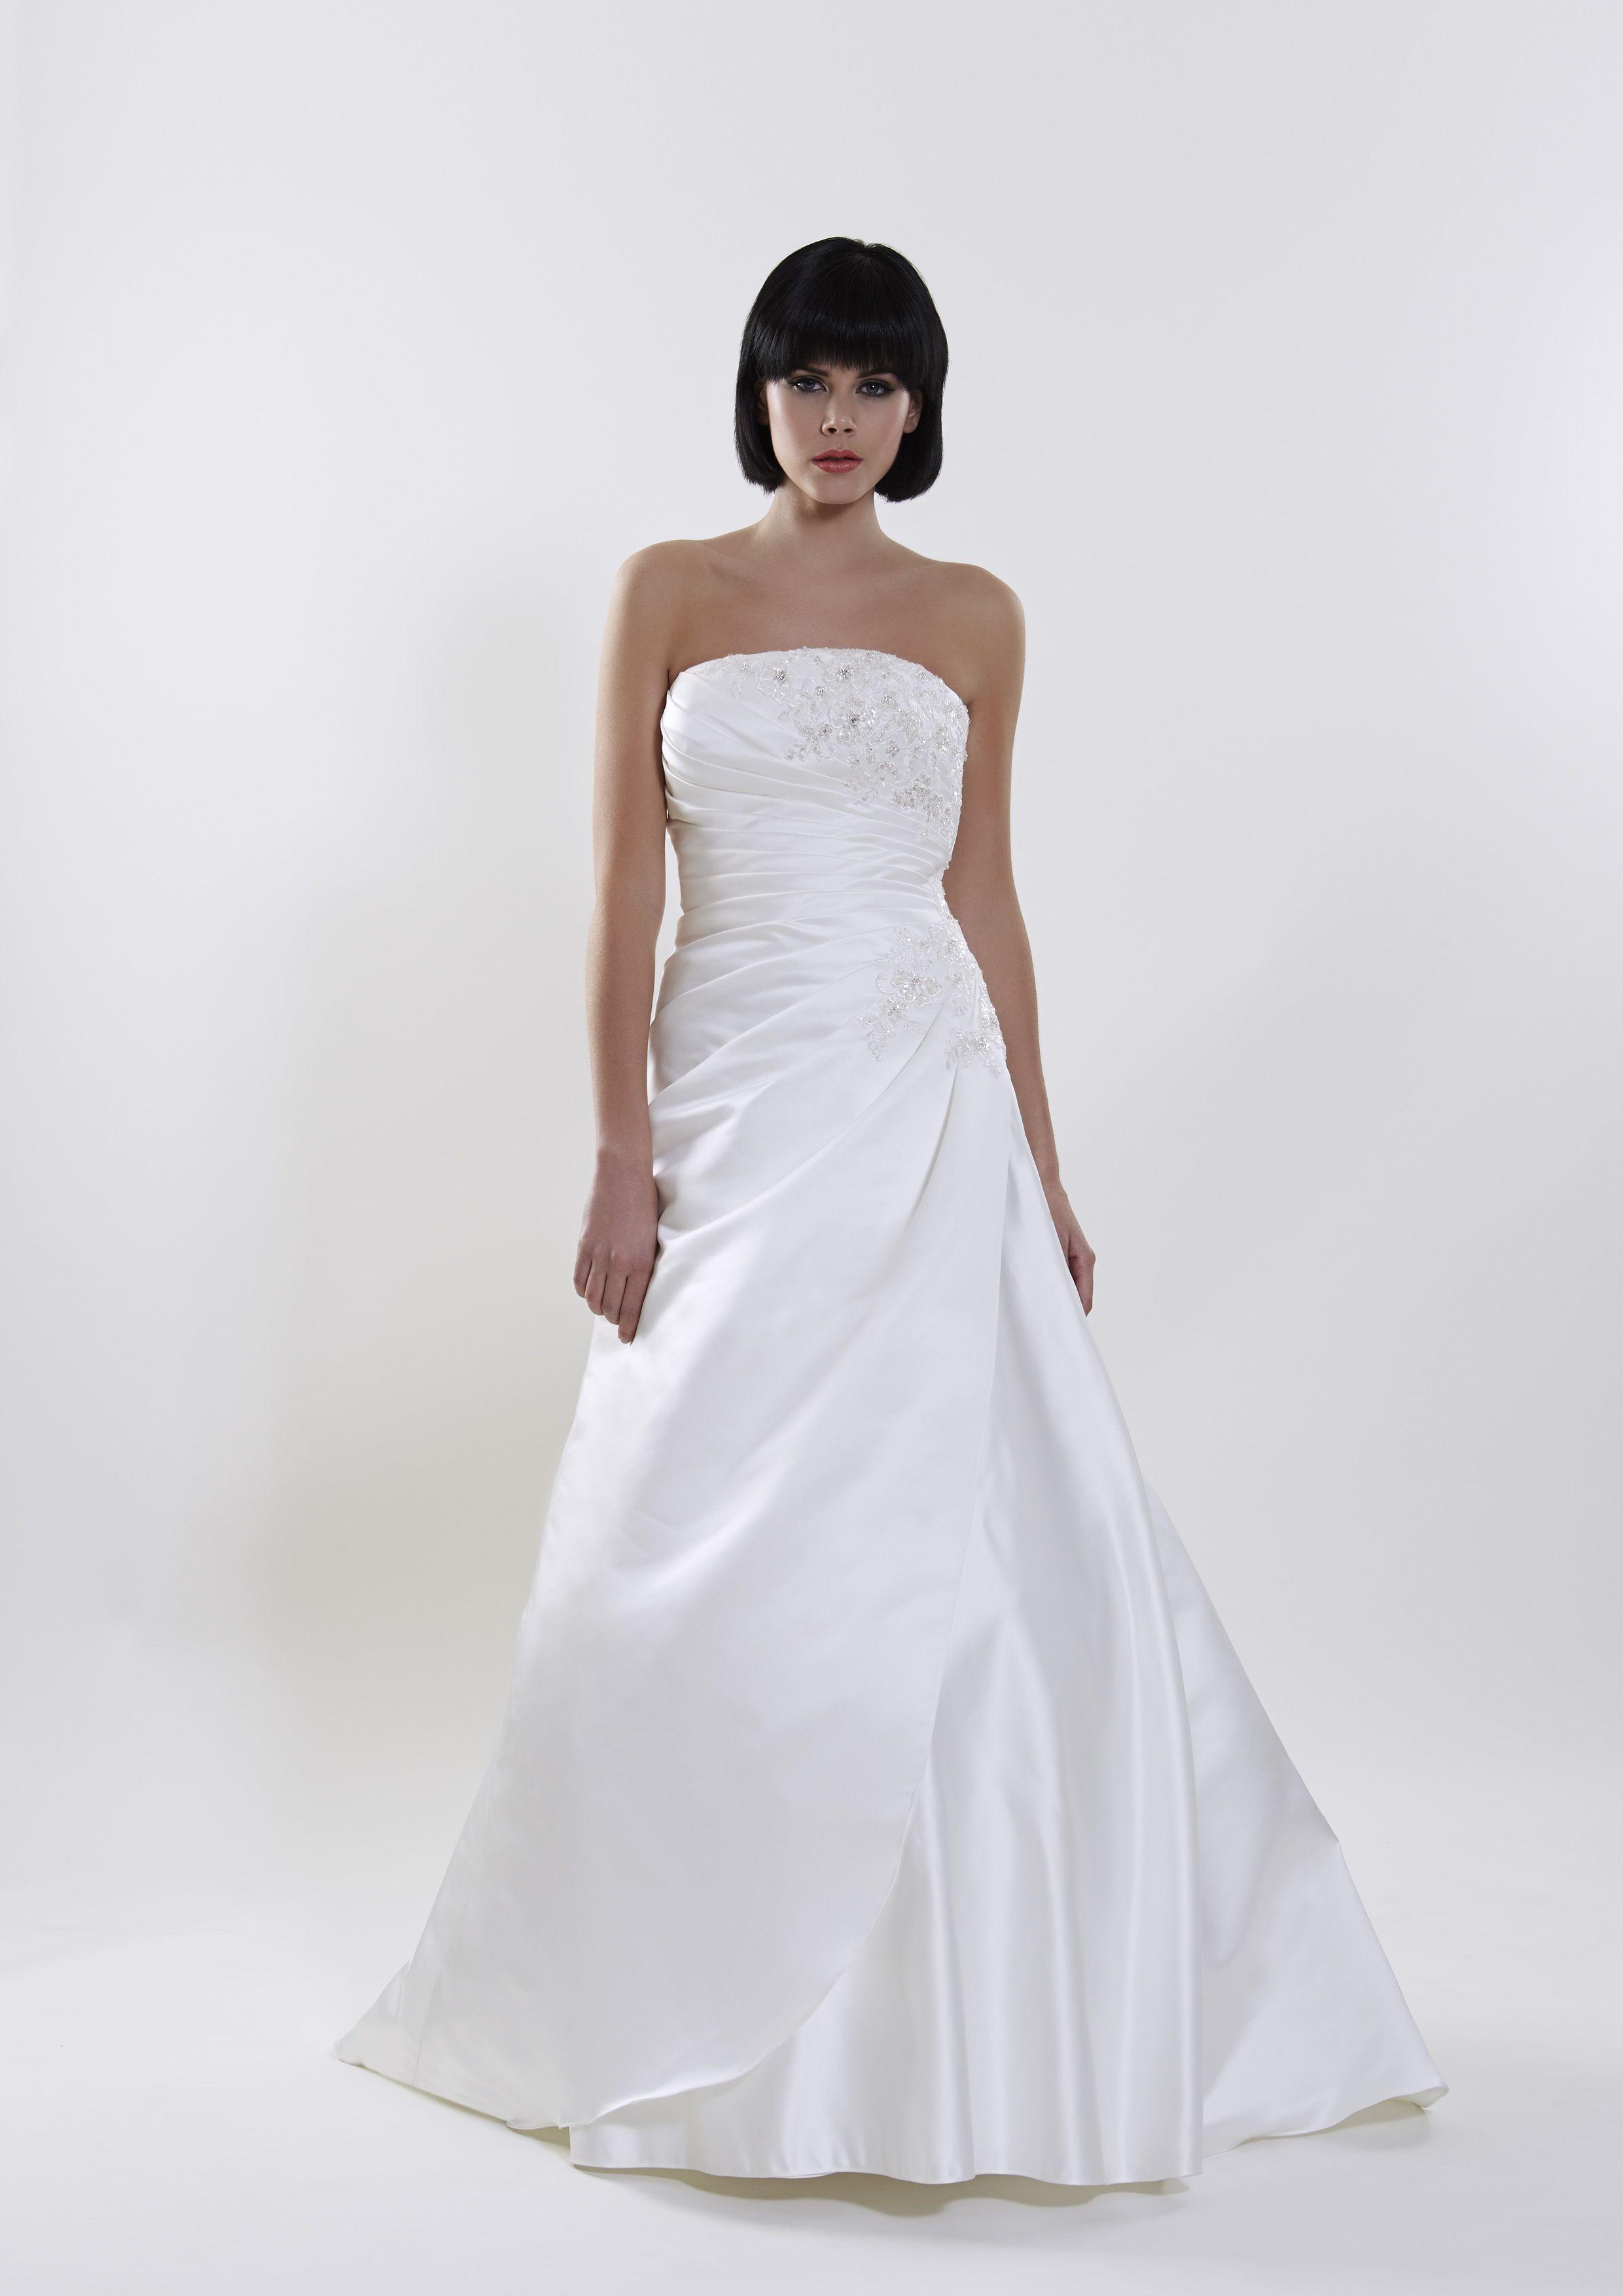 Nice dress  wedding ideas  Pinterest  Bride accessories Wedding